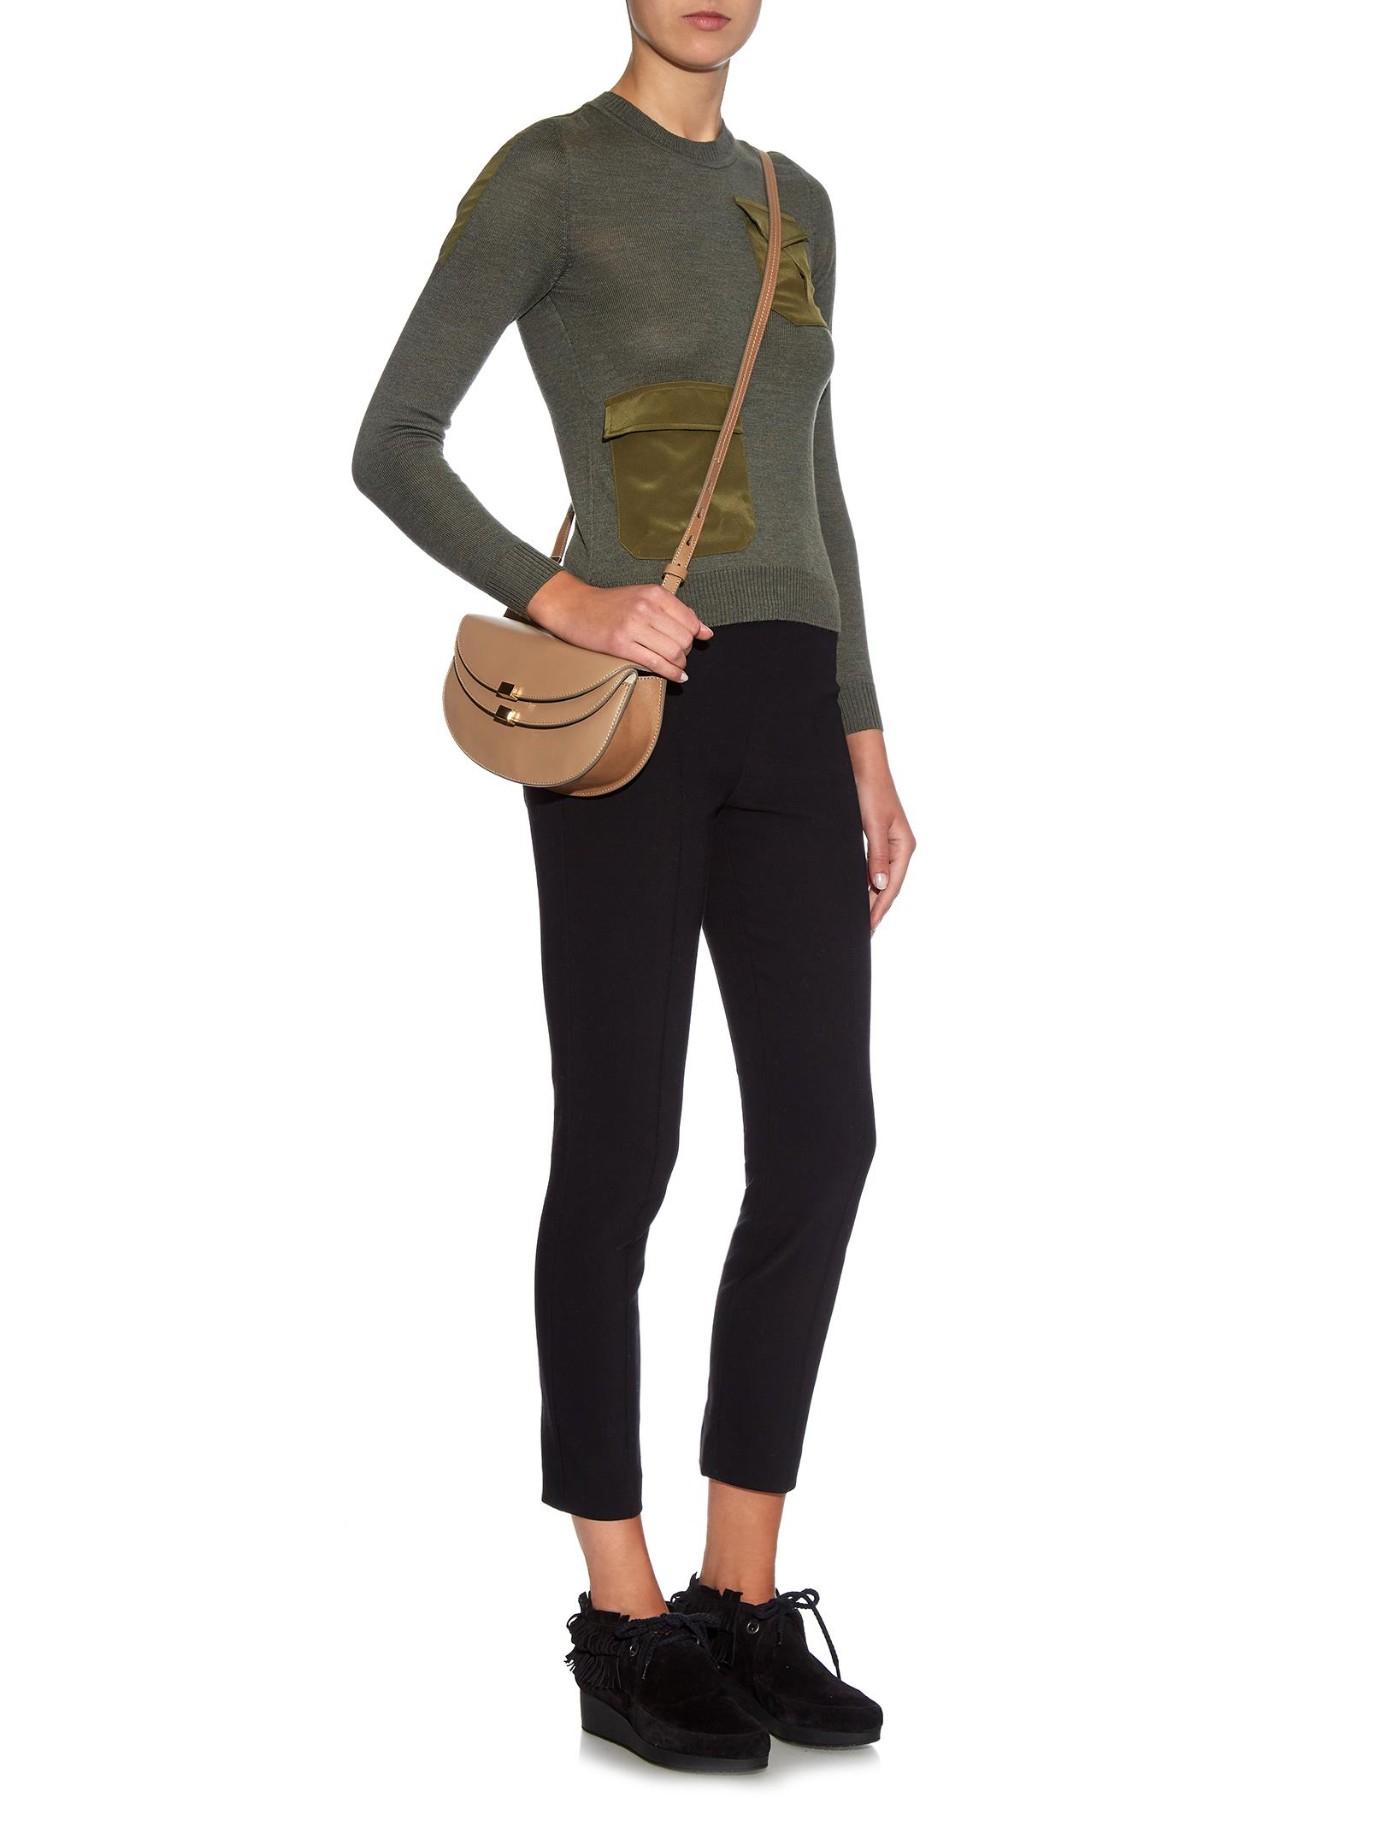 purses chloe - Chlo�� Georgia Mini Leather Cross-Body Bag in Brown (DARK BEIGE) | Lyst